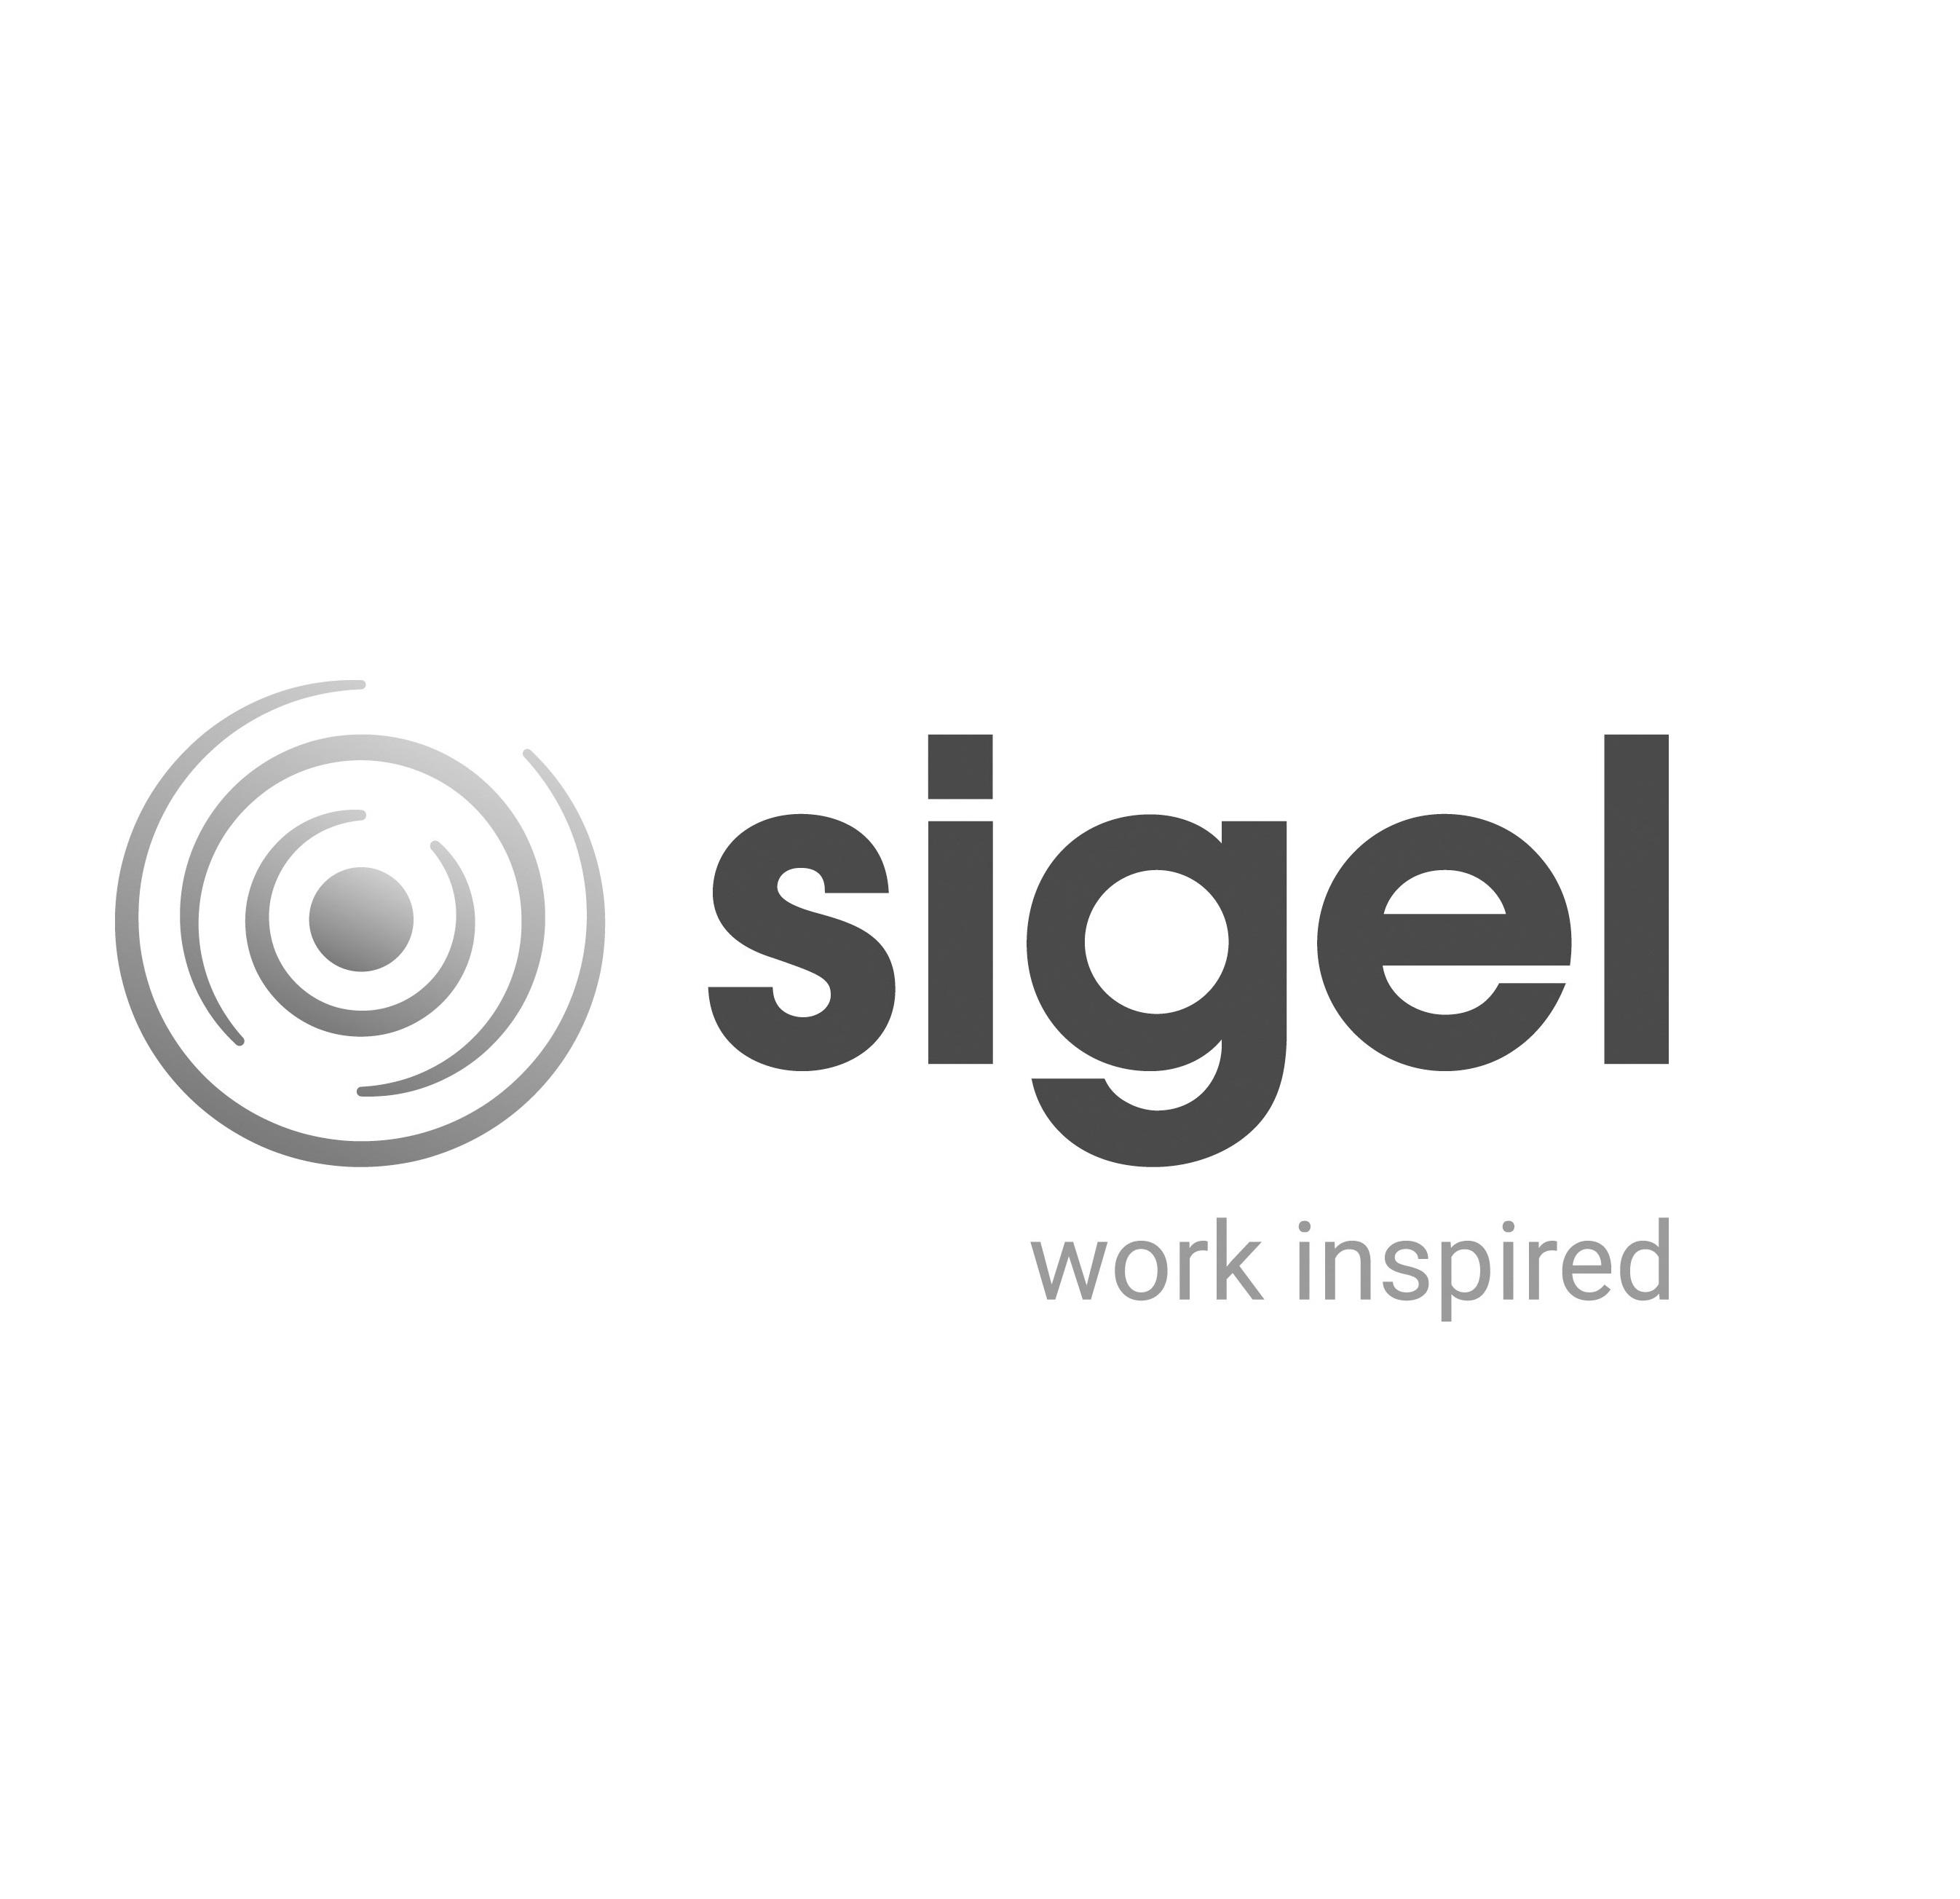 Sigel eyestyle Modern Desktop Accessories Bindertek 3 Letter Tray Set Dropship White SGELTRAY3-WH